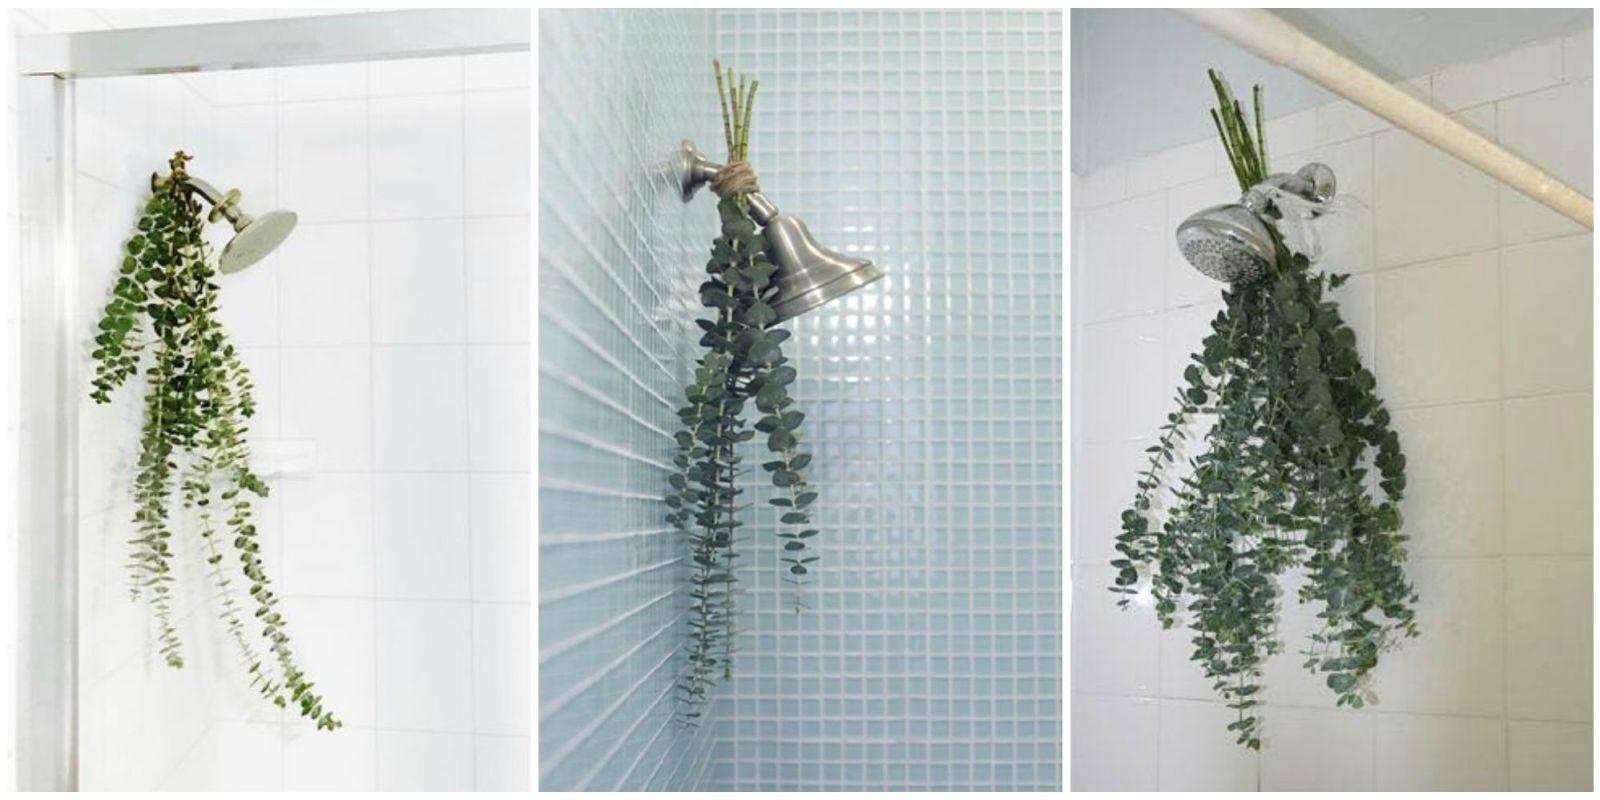 Master Bathroom Que Significa 40 master bathroom ideas and pictures - designs for master bathrooms